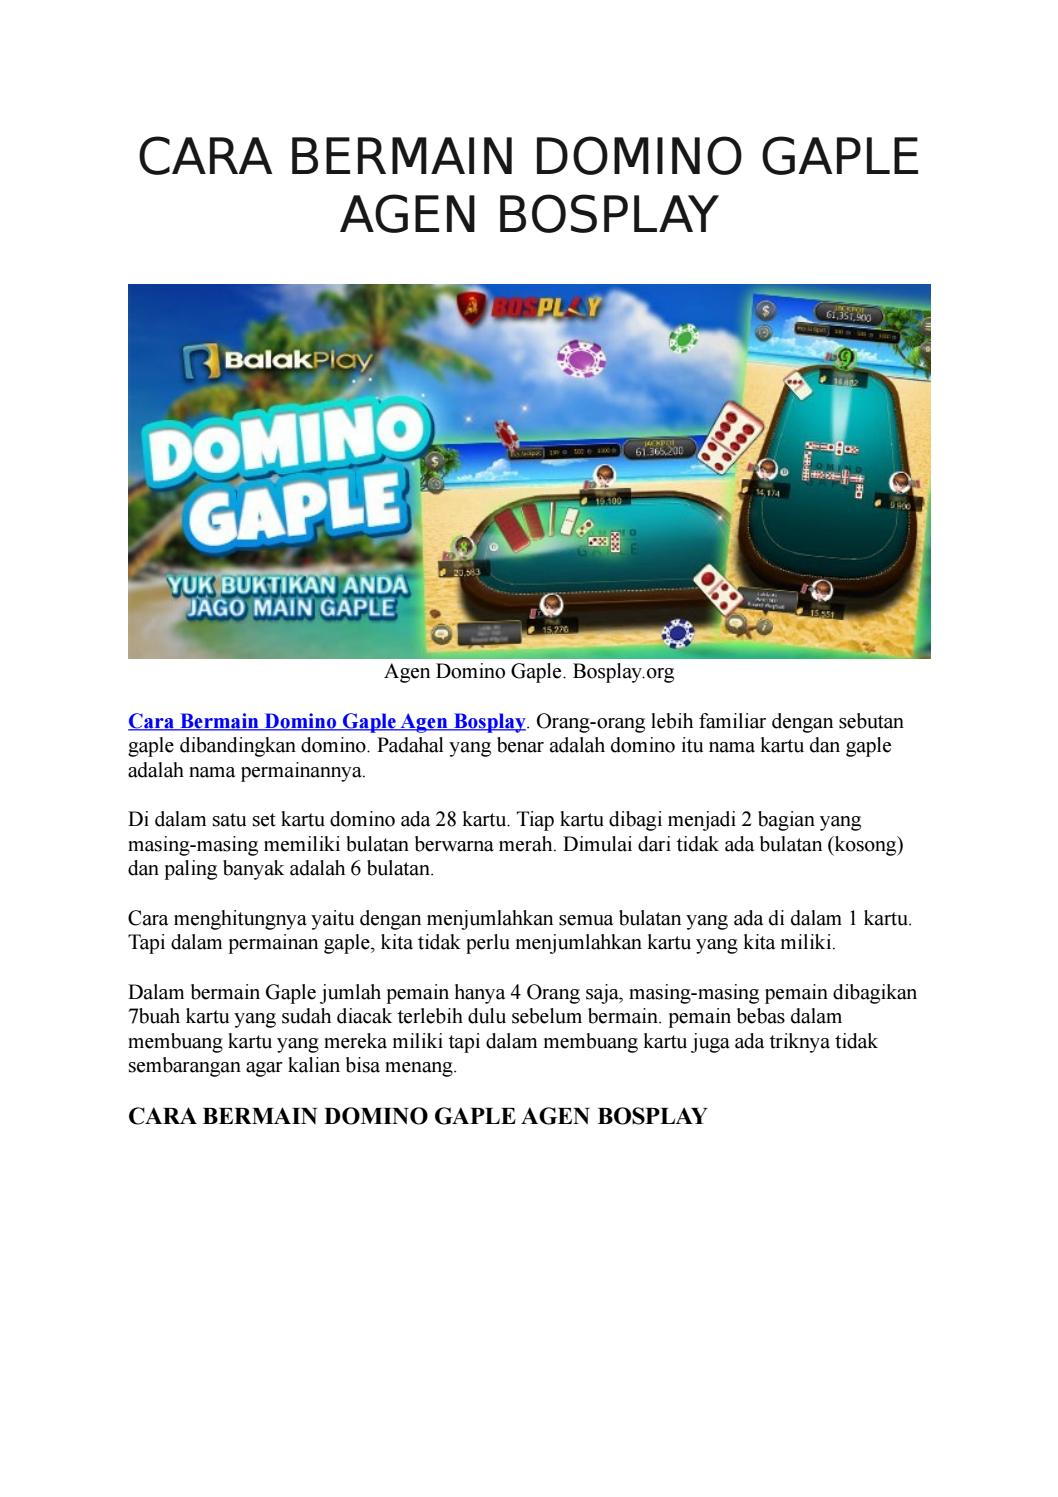 Cara Bermain Domino Agen Bosplay By Bosplay Issuu